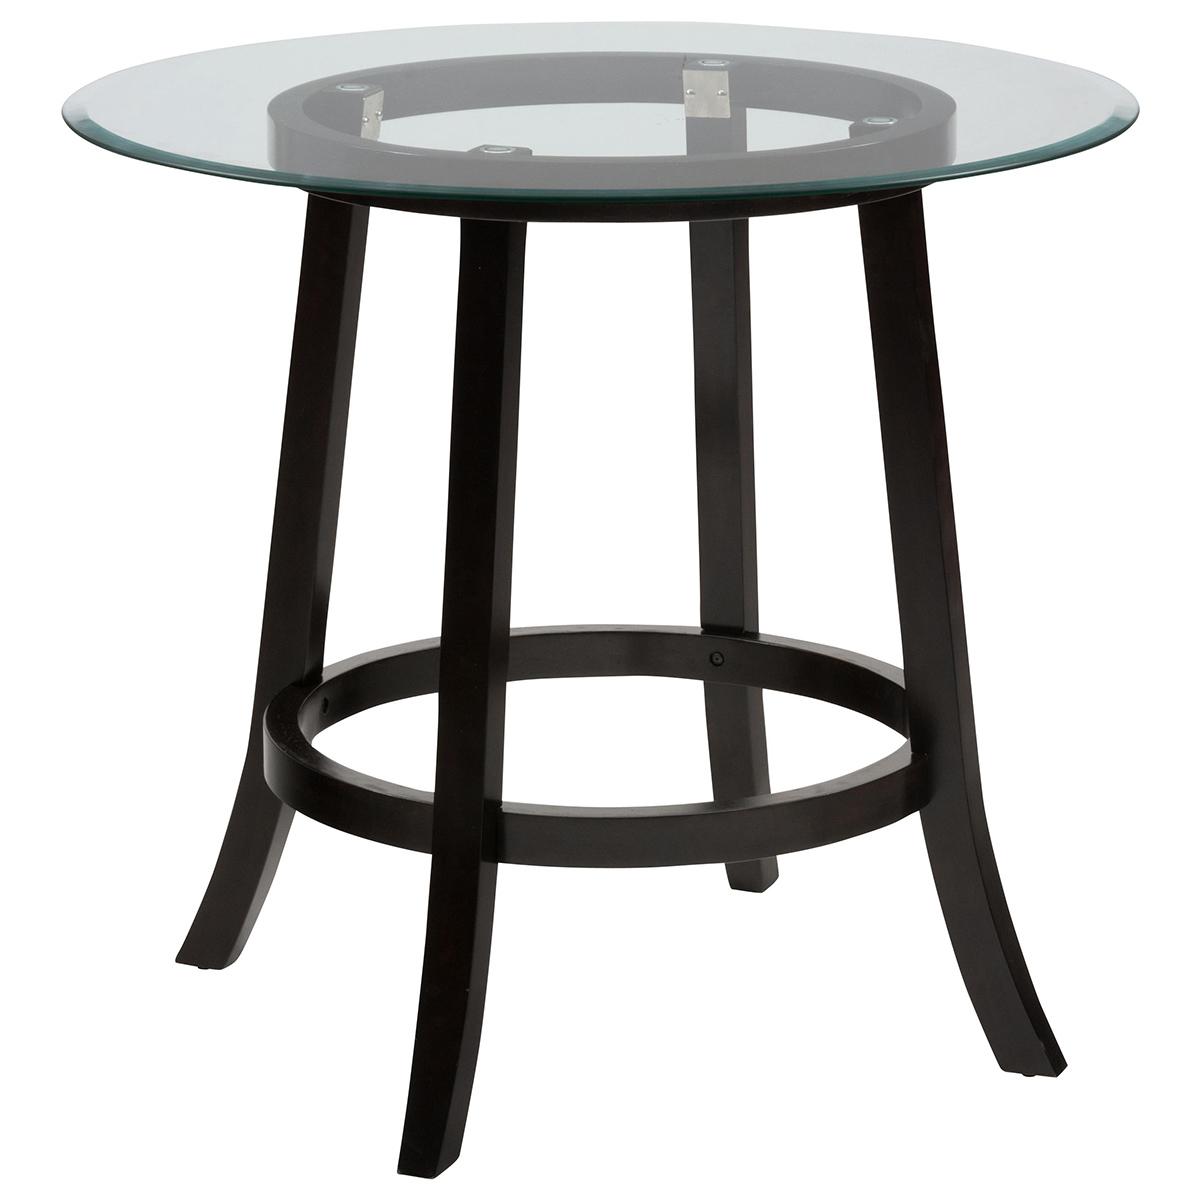 jofran bgrd aaron pub table w  round glass top - aaron pub table w  round glass top